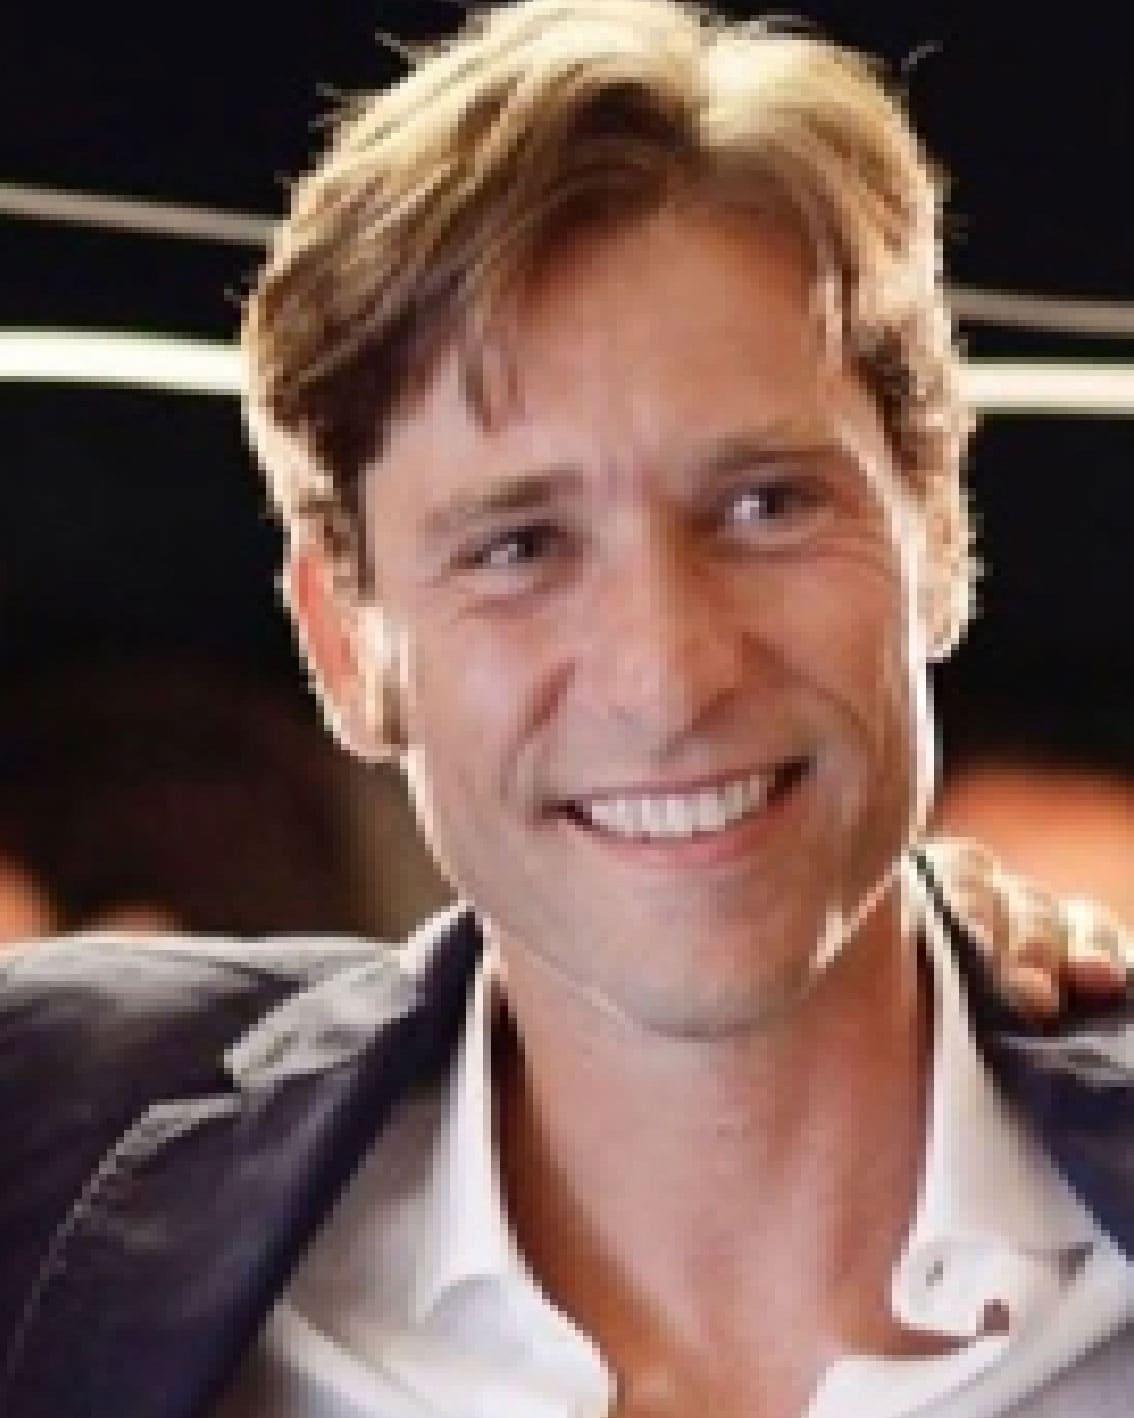 Iacopo De Angelis